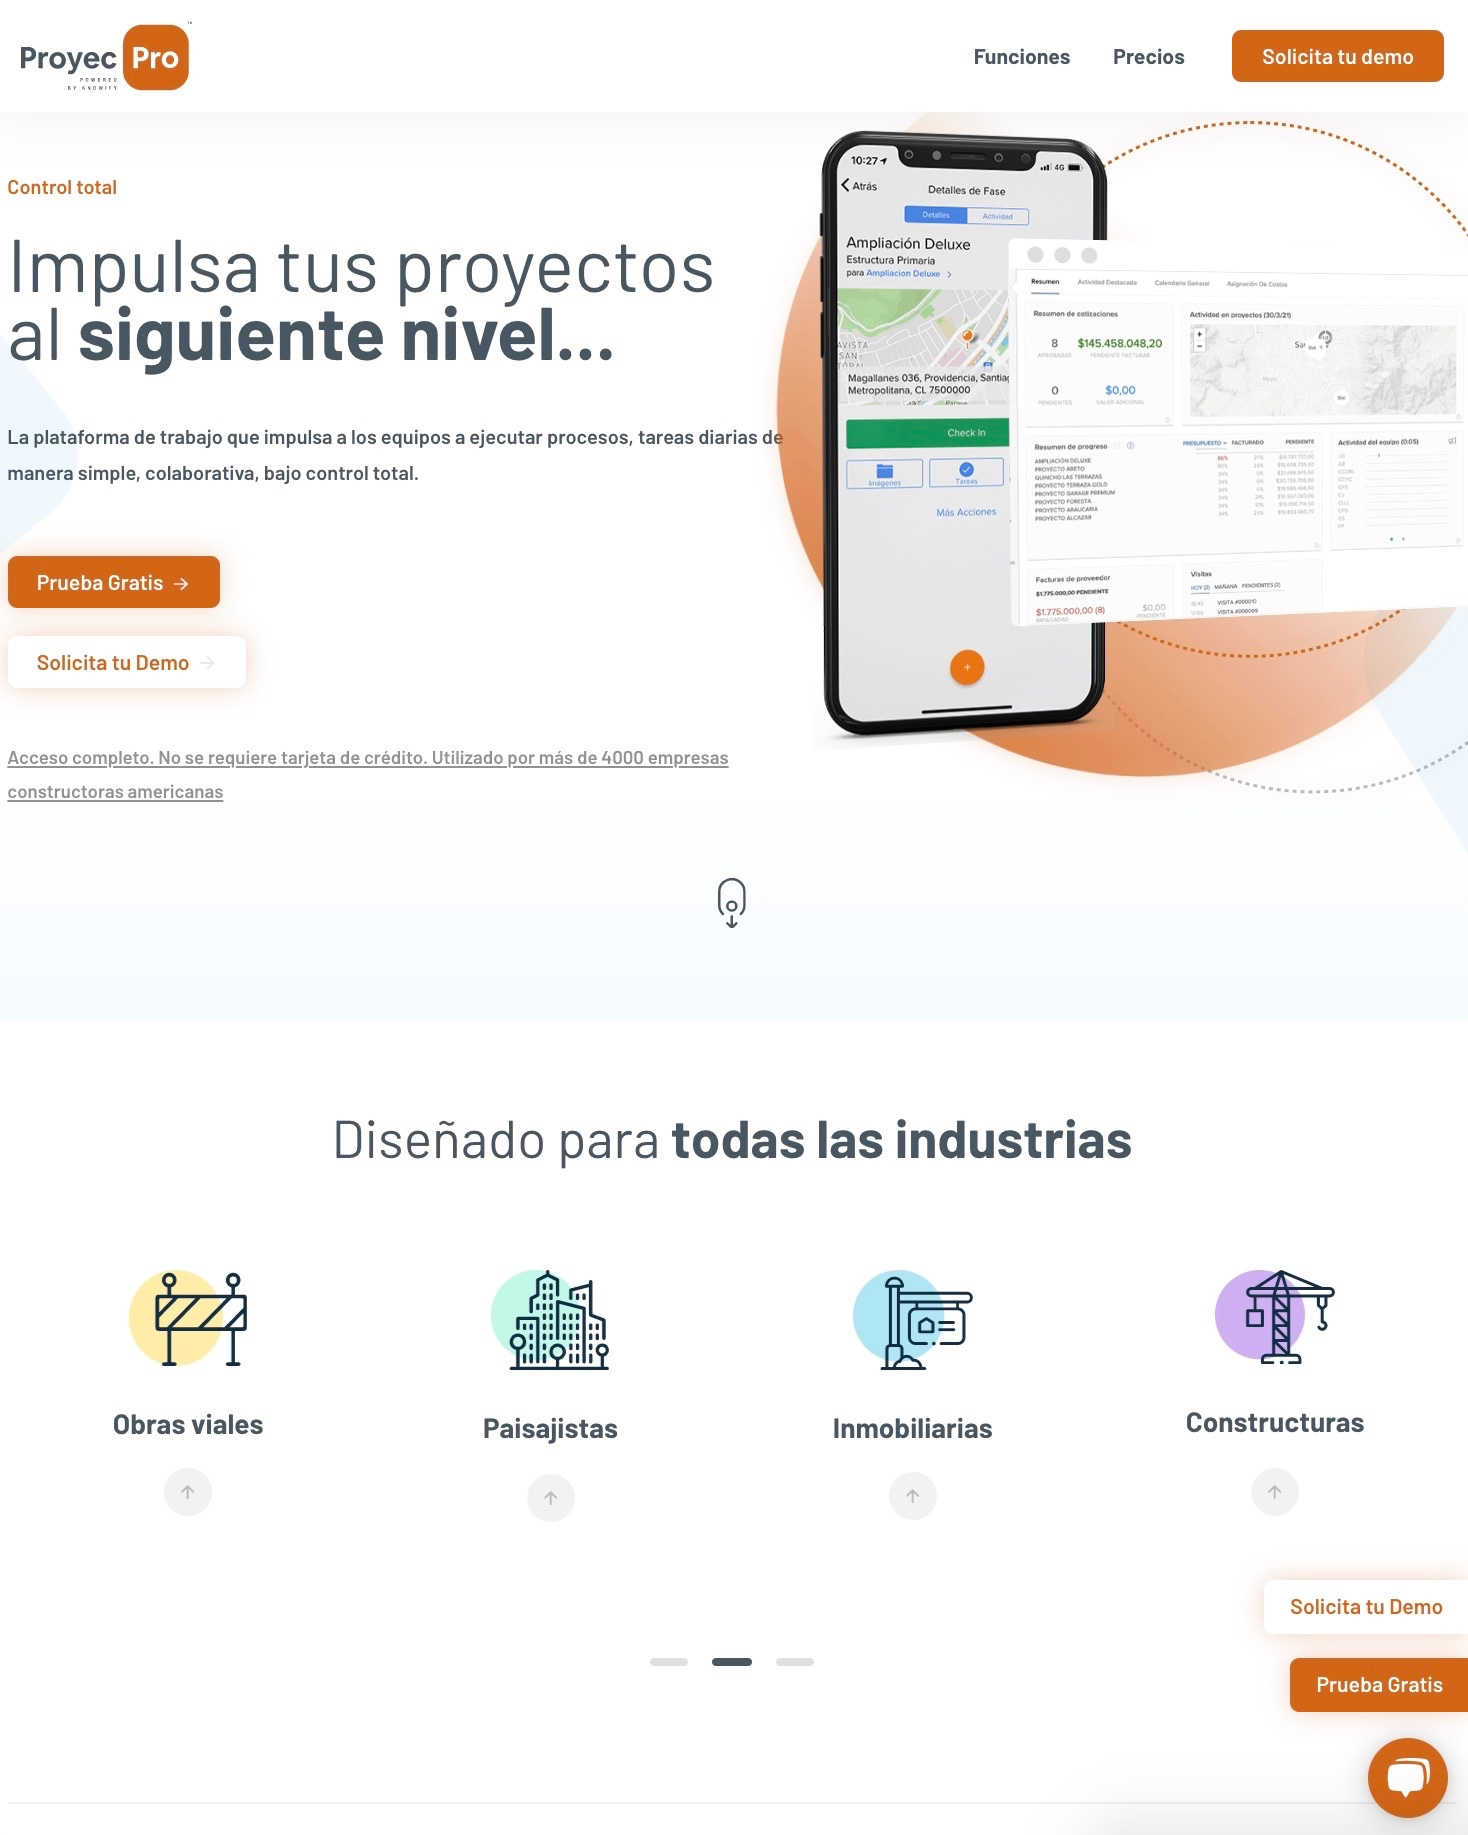 sondys online marketing web design web development houston proyecpro.com